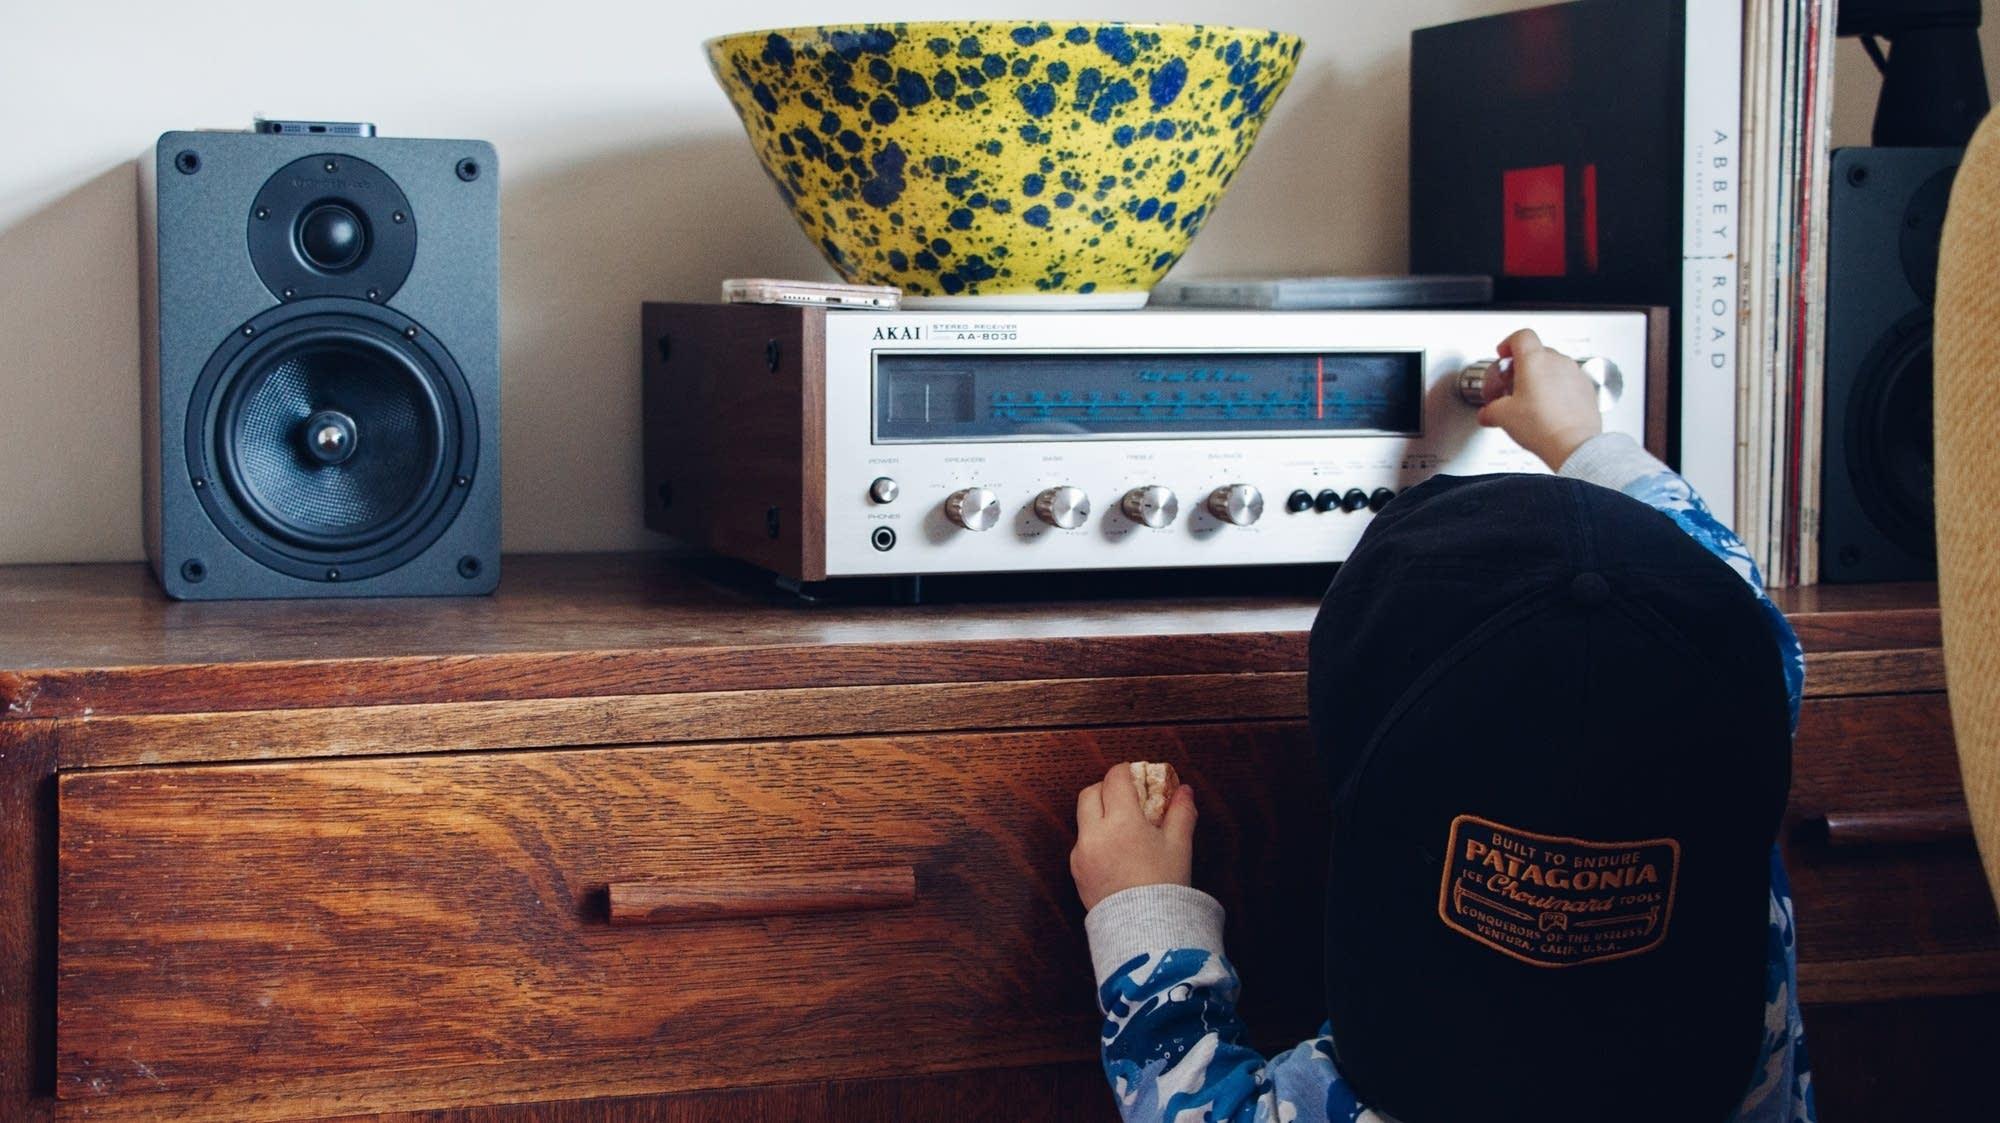 Child adjusting radio knob